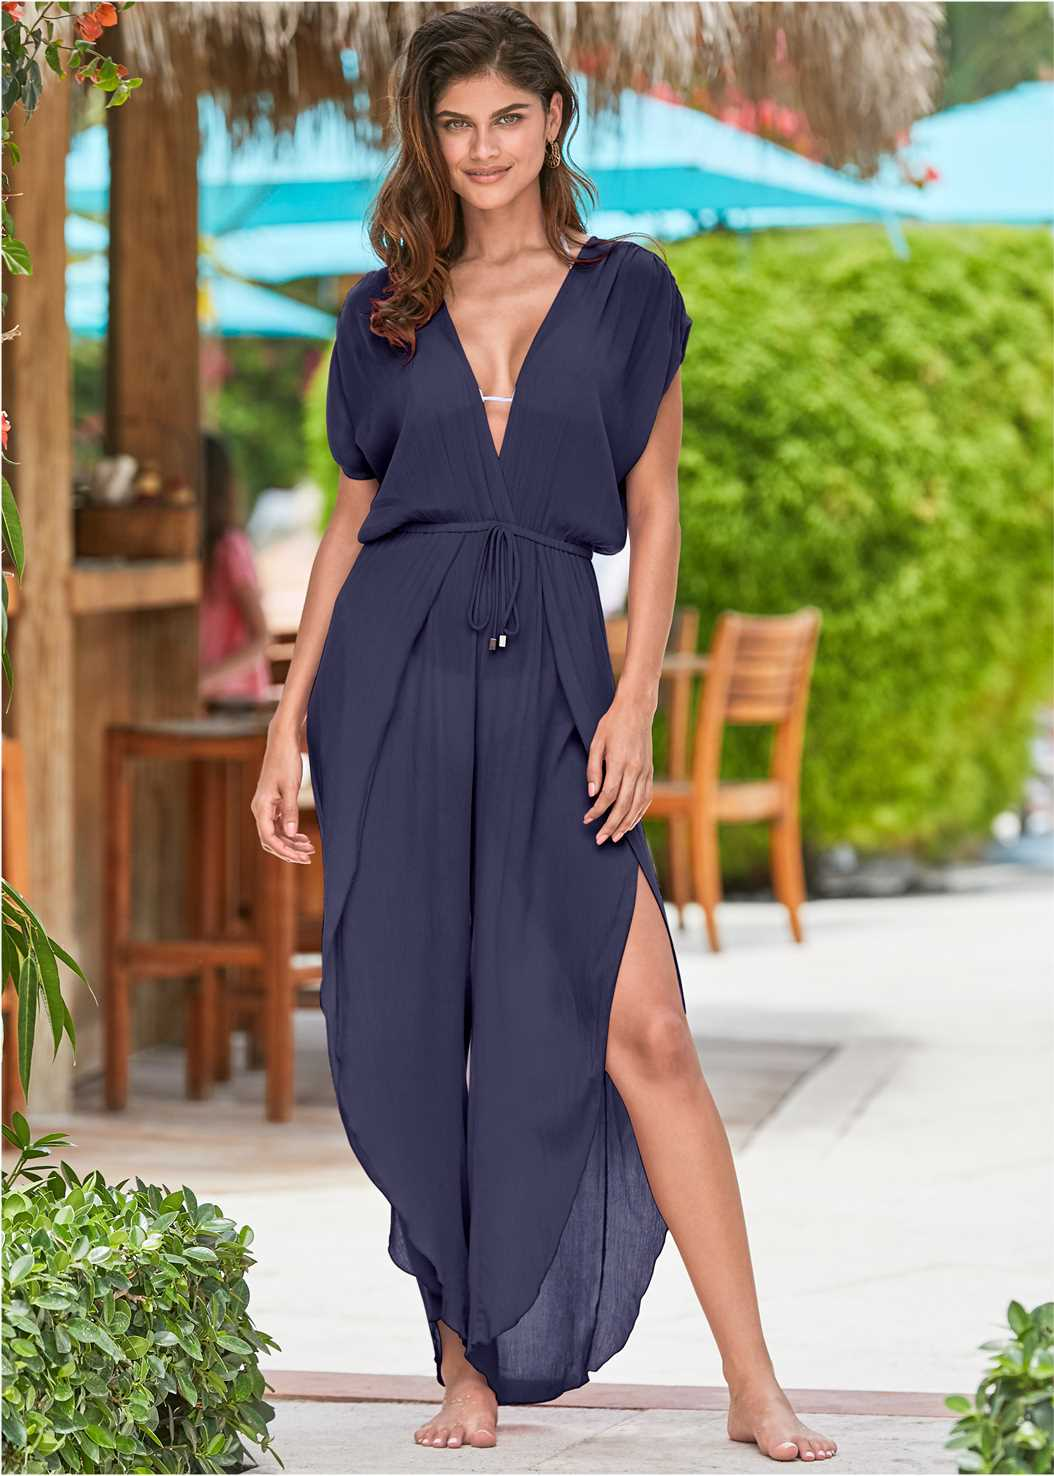 Side Slit Cover-Up Jumpsuit,Triangle String Bikini Top,Scoop Front Classic Bikini Bottom ,Multi Color Stone Sandals